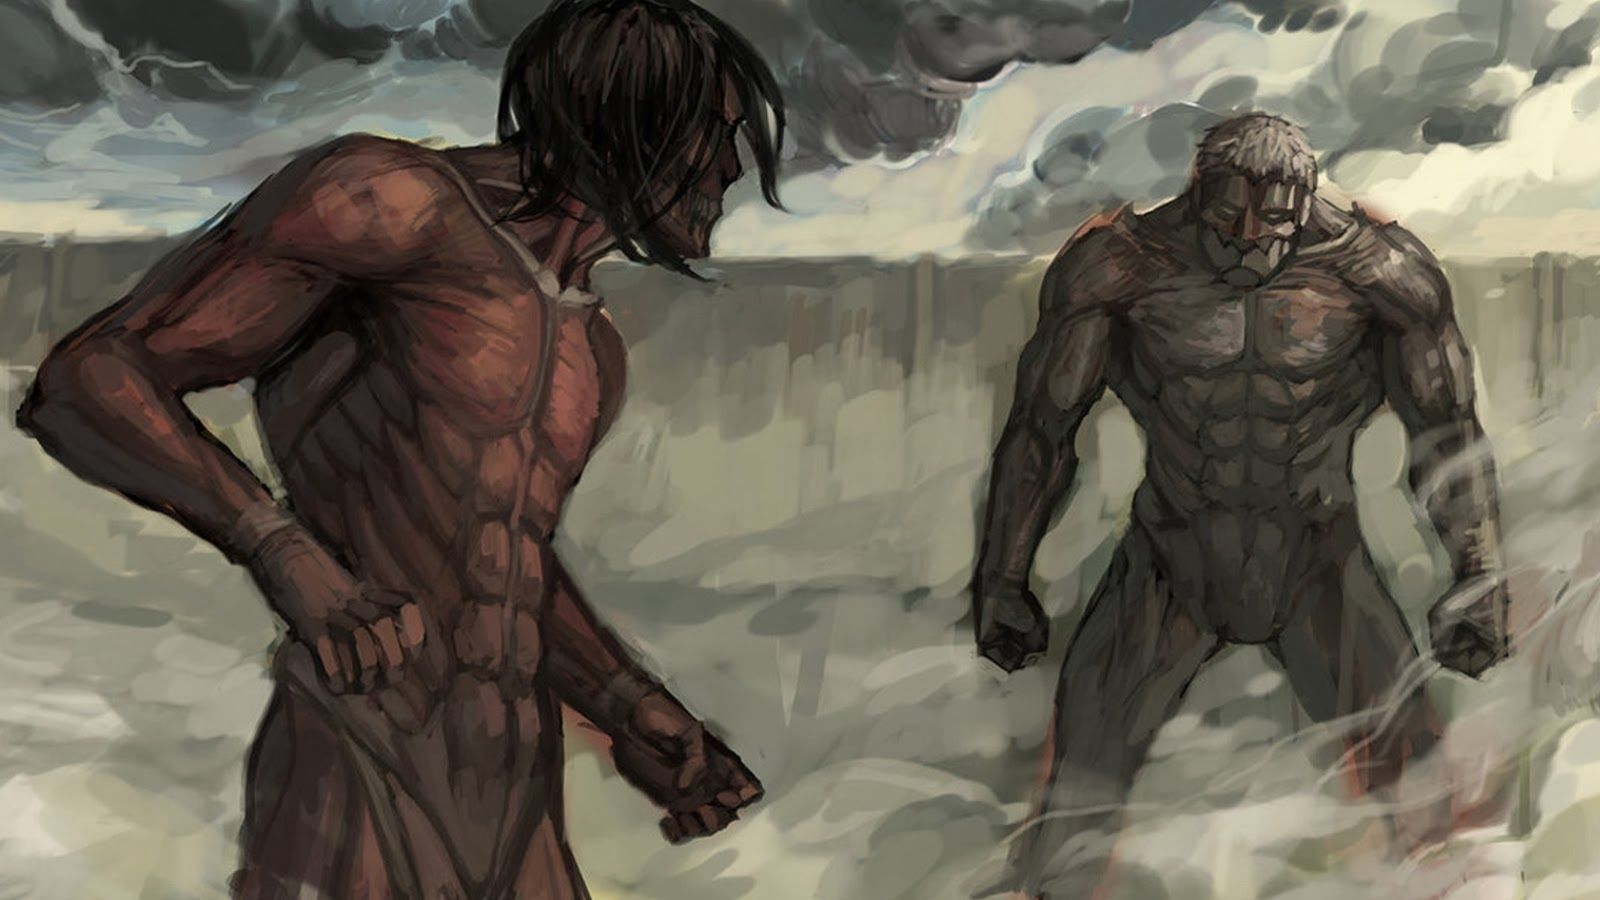 Armored Titan Titan Armored Titan Vs Rogue Attack On Titan Art